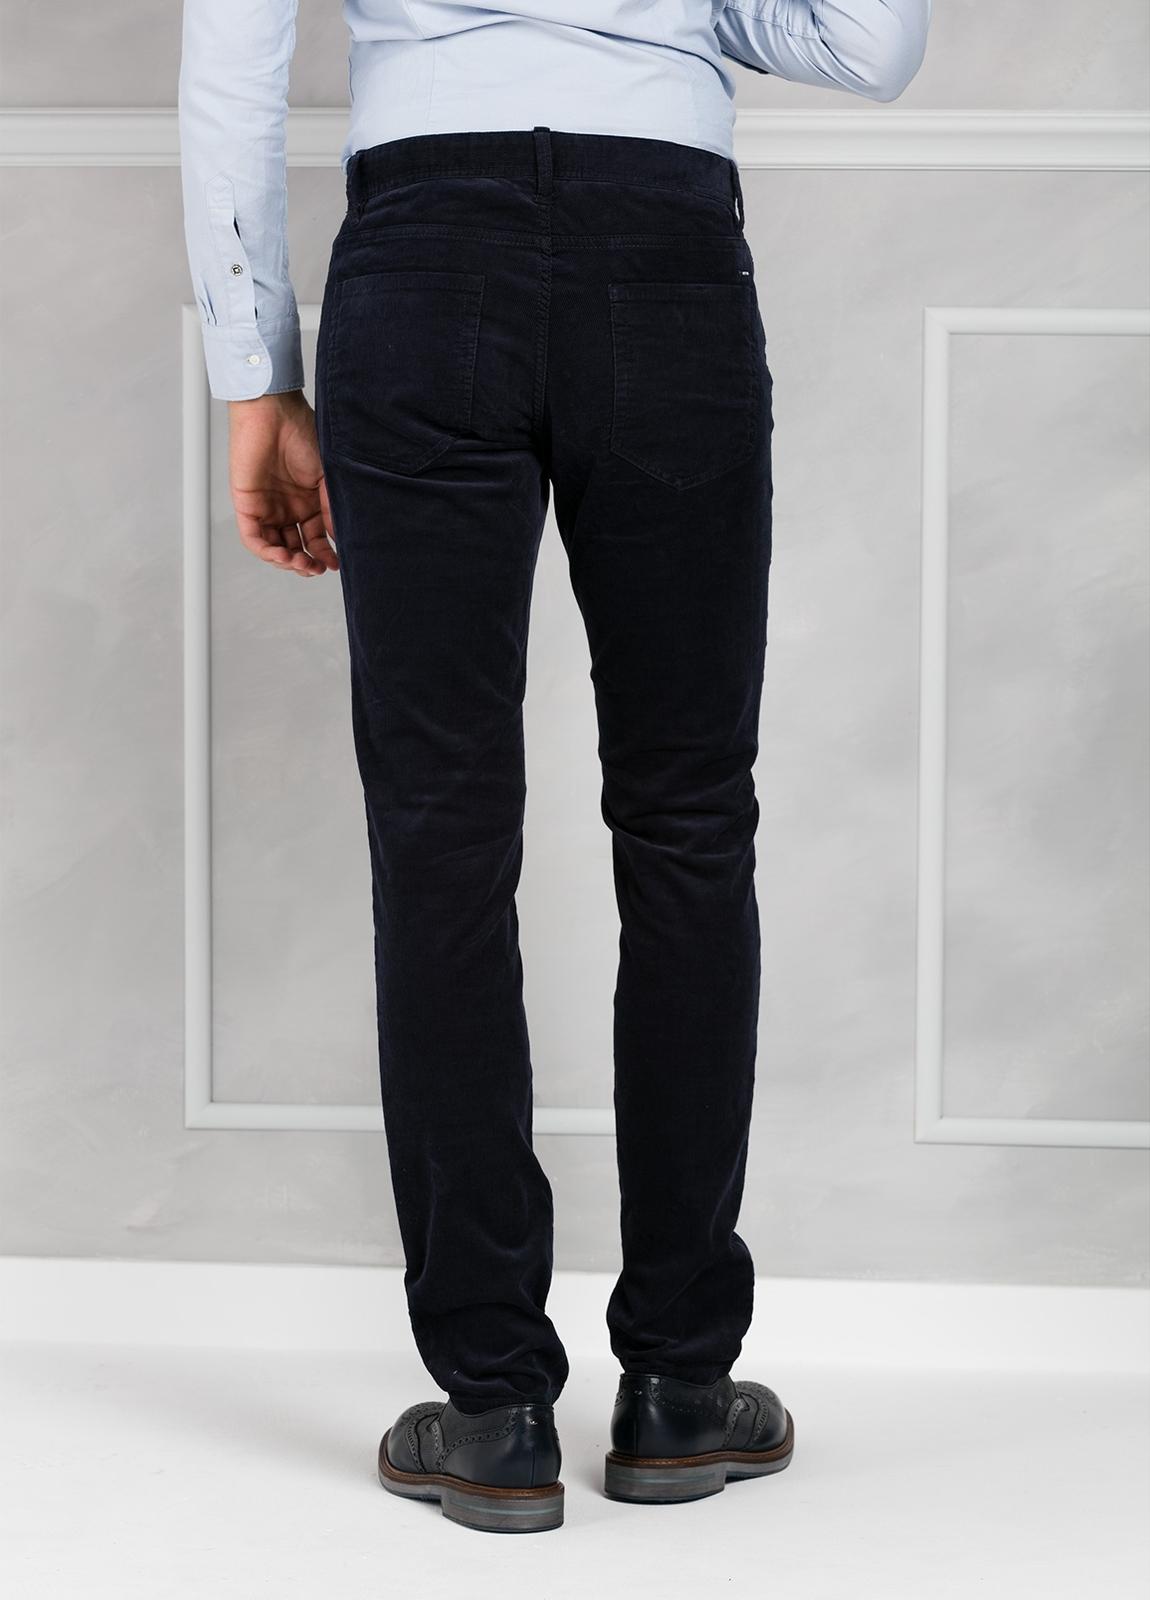 Pantalón 5 bolsillos micropana modelo FRED color azul marino. 98% Algodón 2% Elastano. - Ítem2